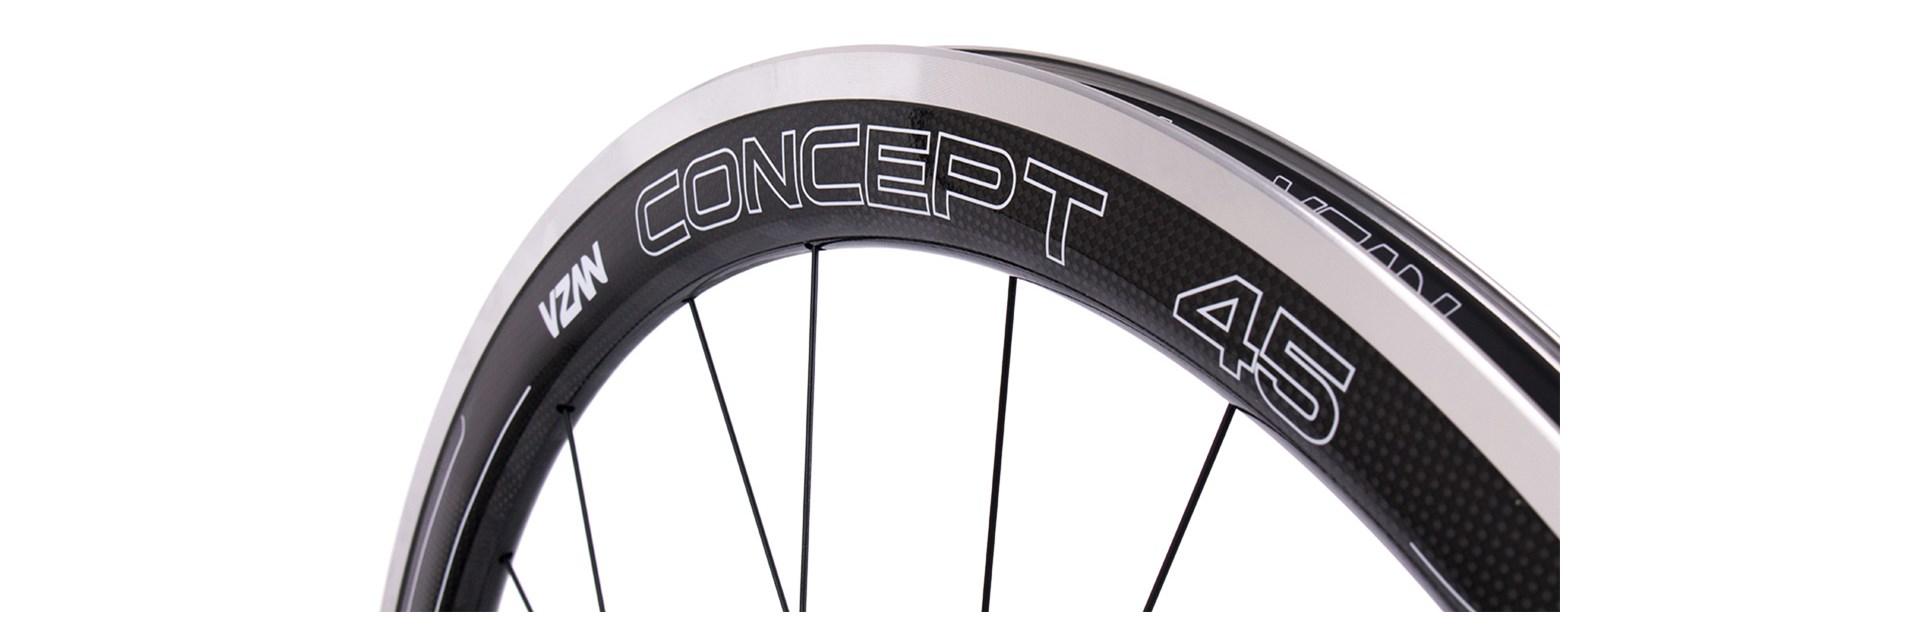 Roda Concept Carbon 45C